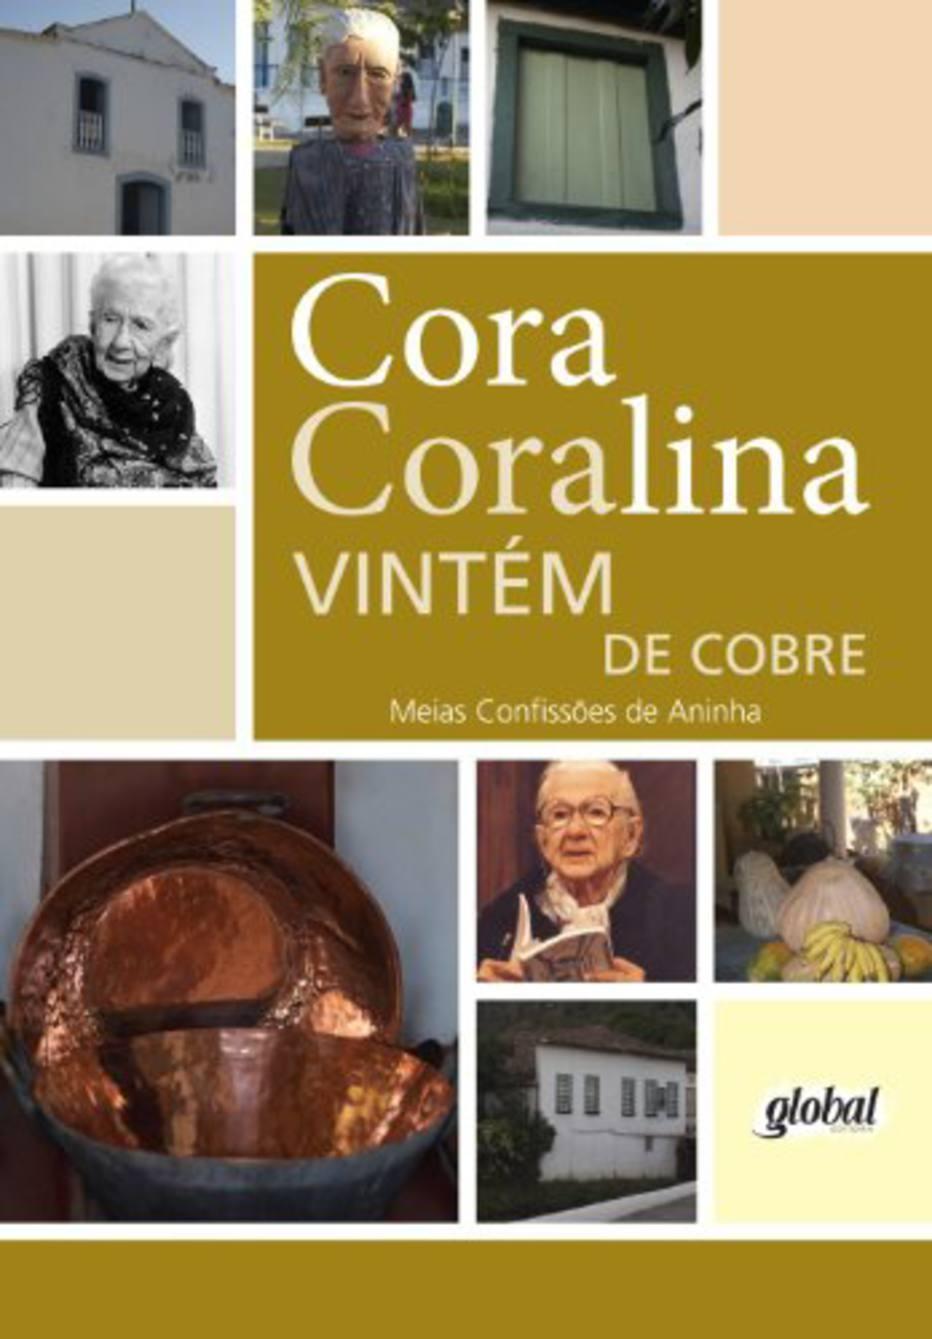 Cora 3